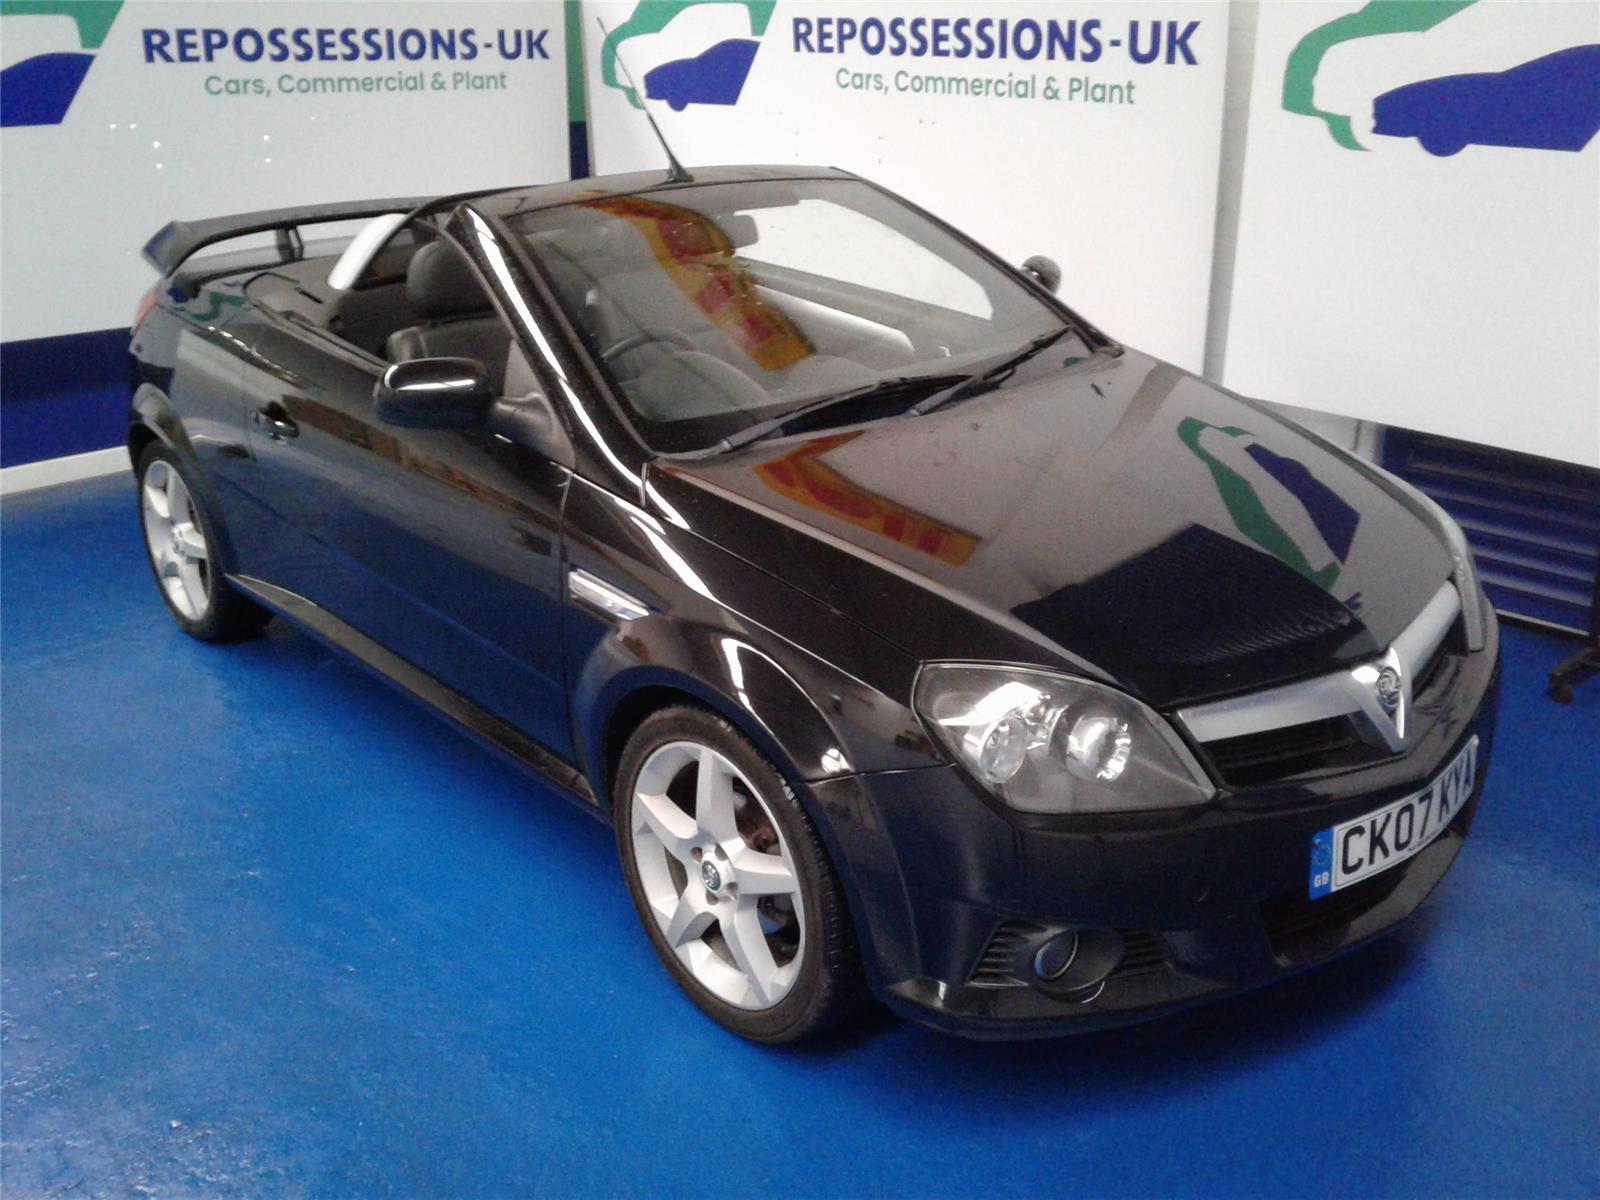 2007 Vauxhall Tigra EXCLUSIV (CC) 1796 Petrol Manual 5 Speed 2 Door Cabriolet